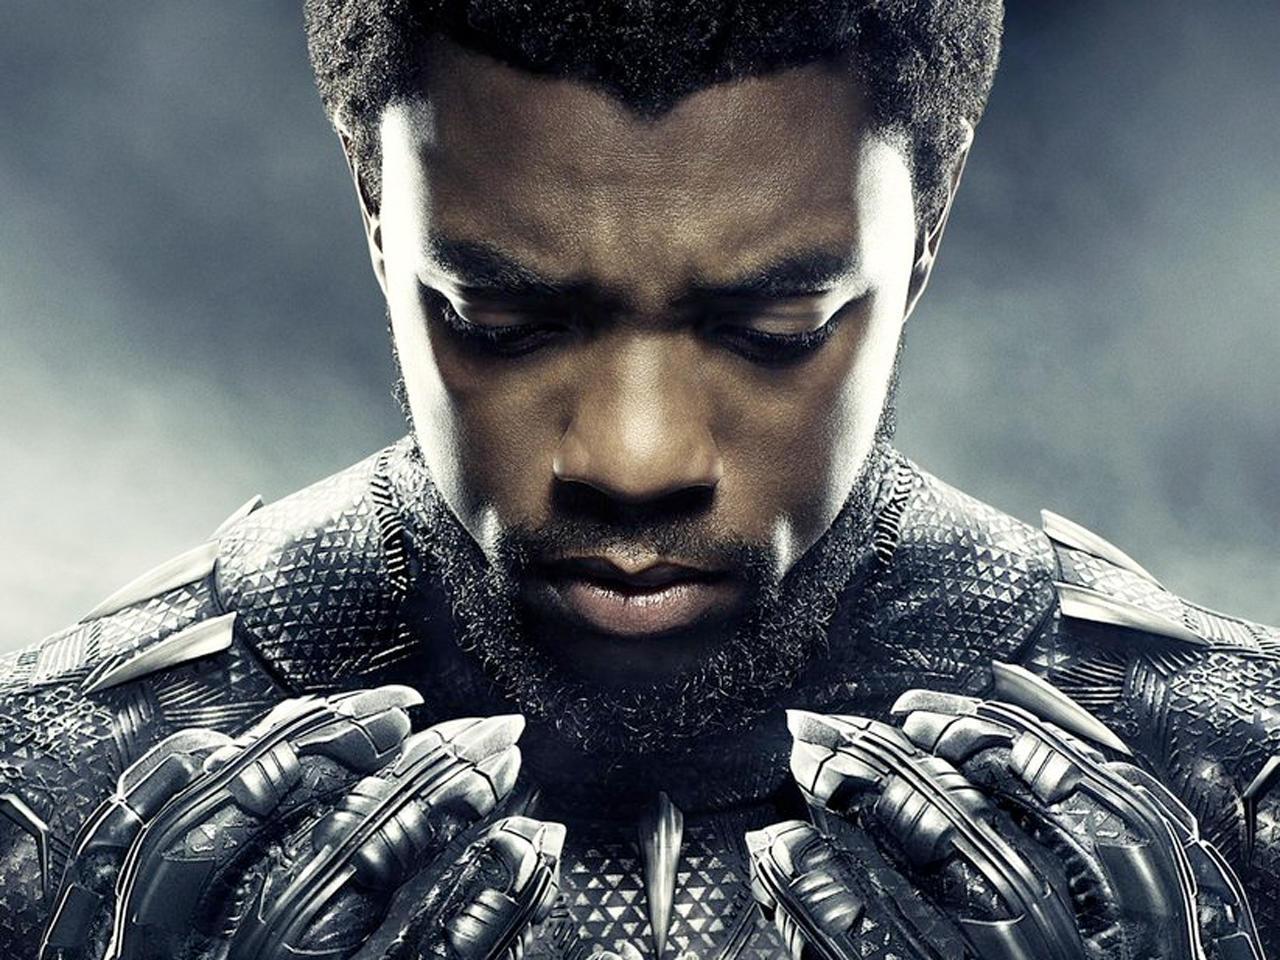 The Black Panther Died-Rip- Chadwick Boseman-Social Pakora